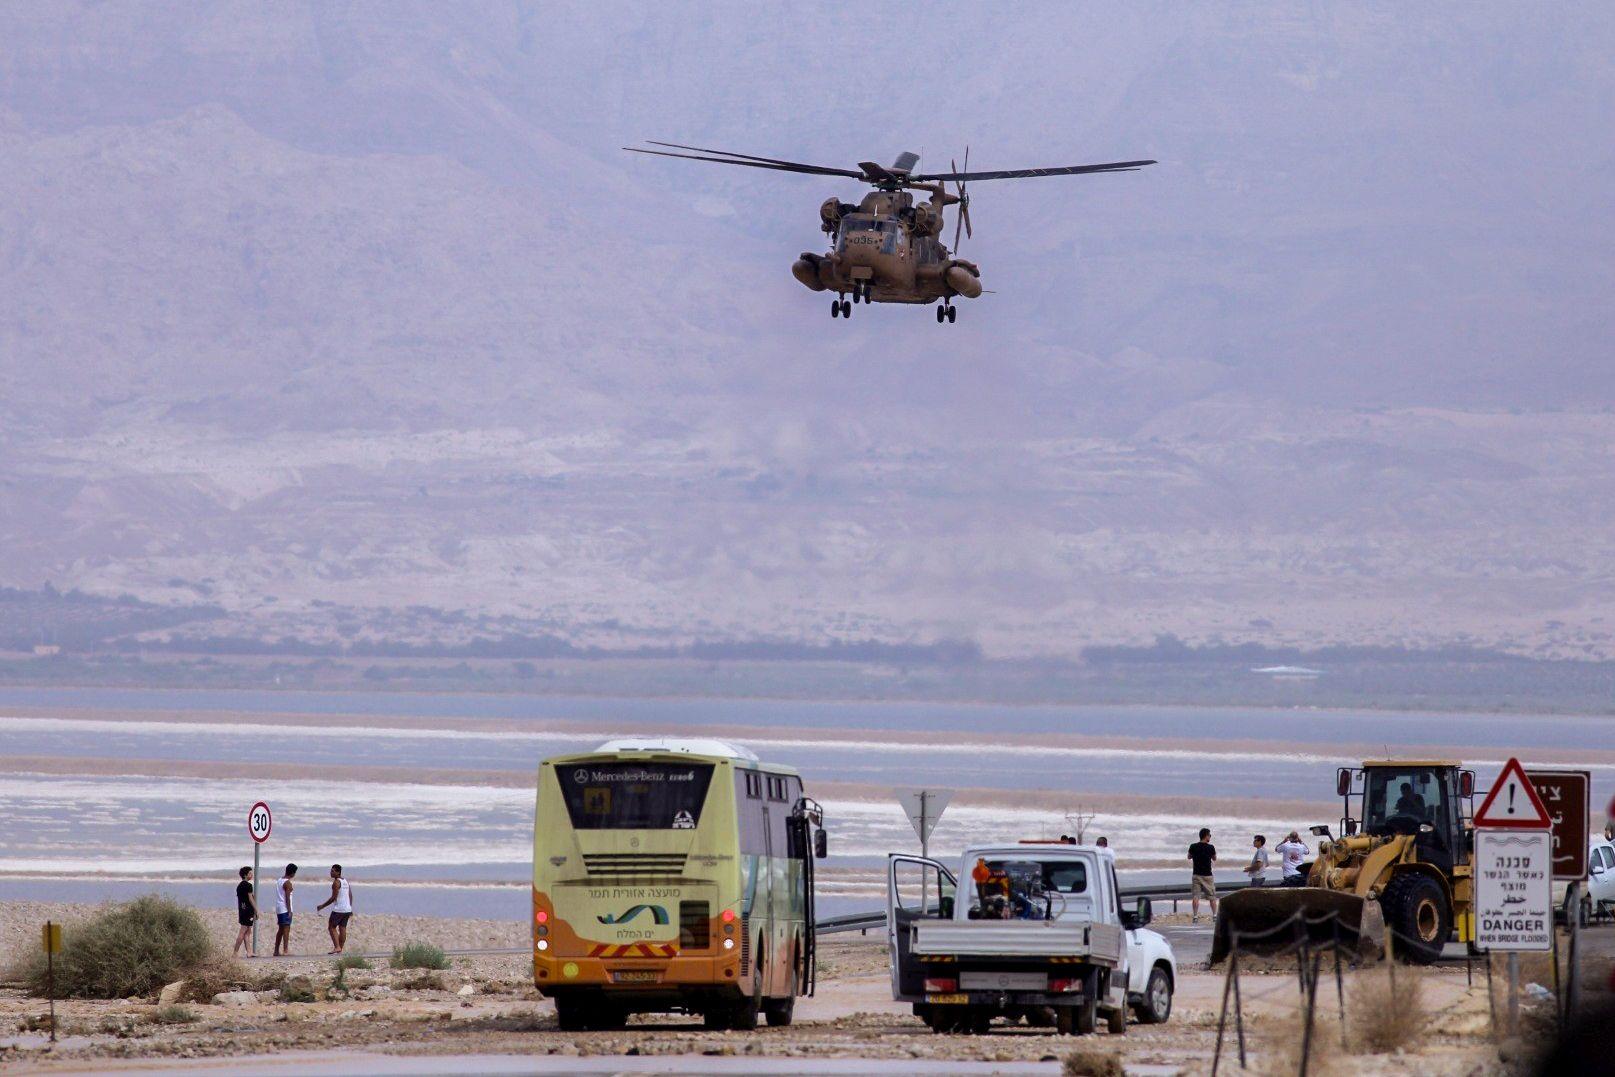 Ten students have died in S. Israel desert flood disaster